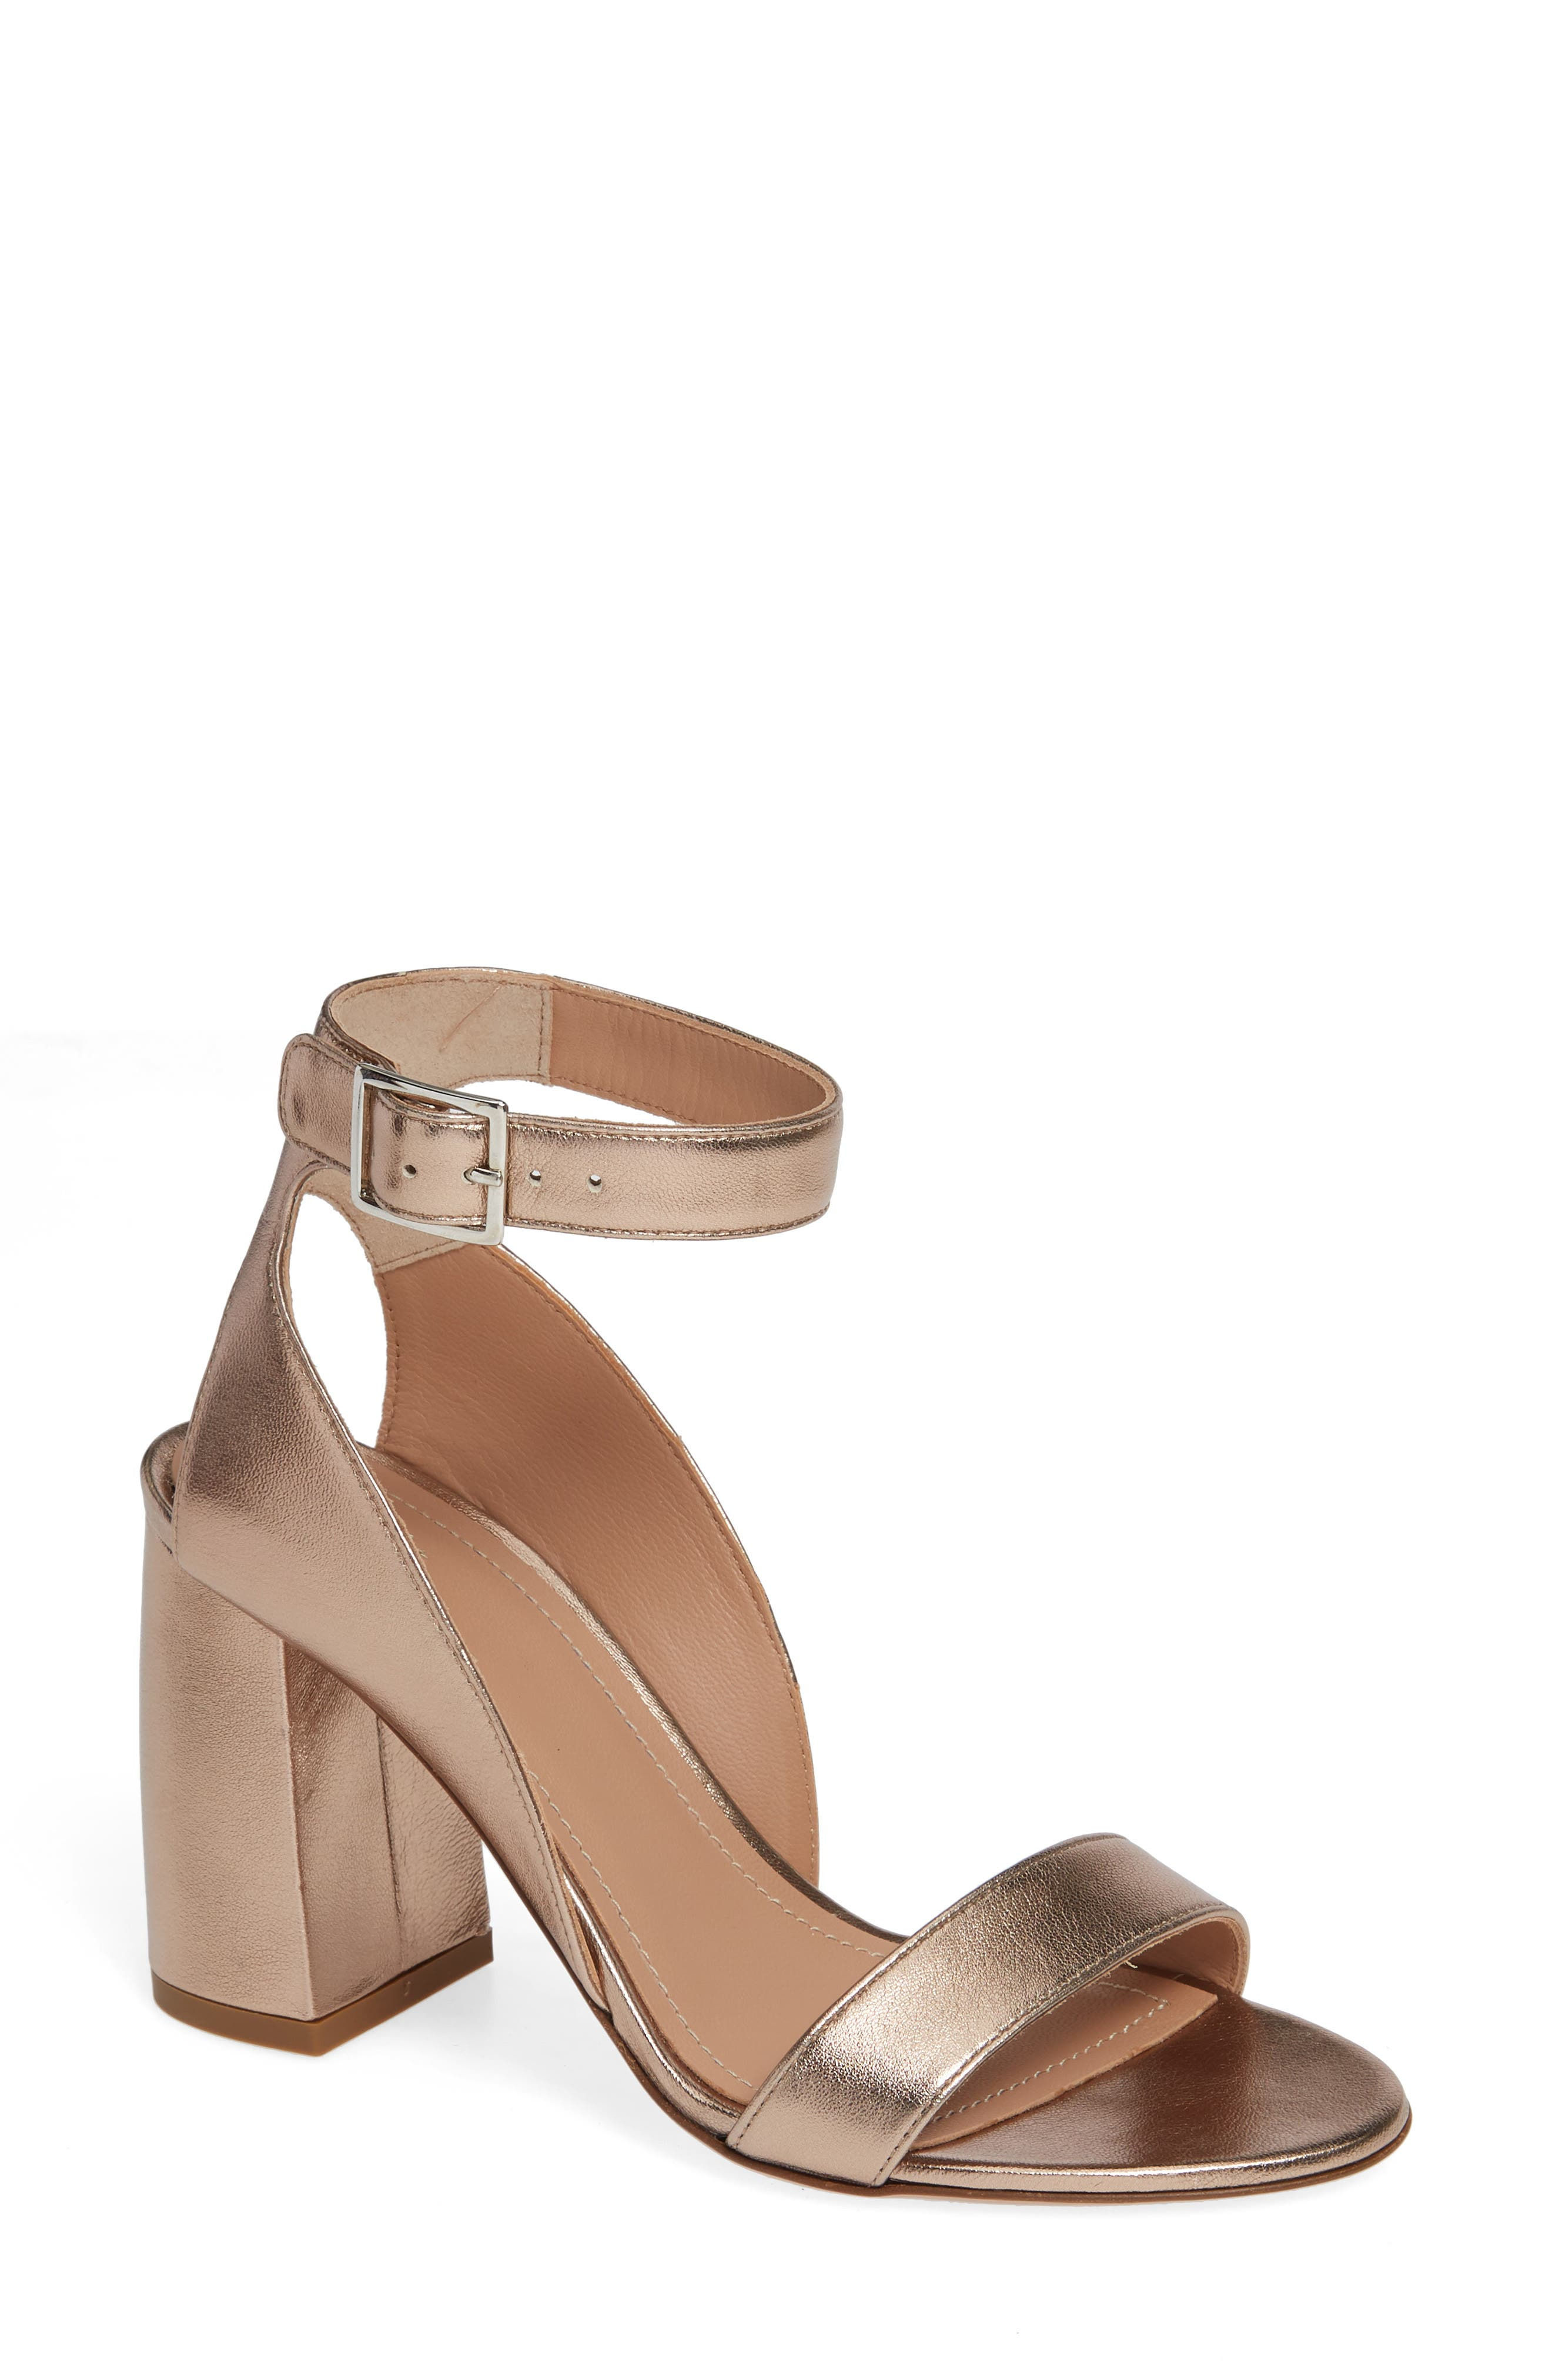 Guilia Block Heel Sandal,                         Main,                         color, BRONZE LEATHER